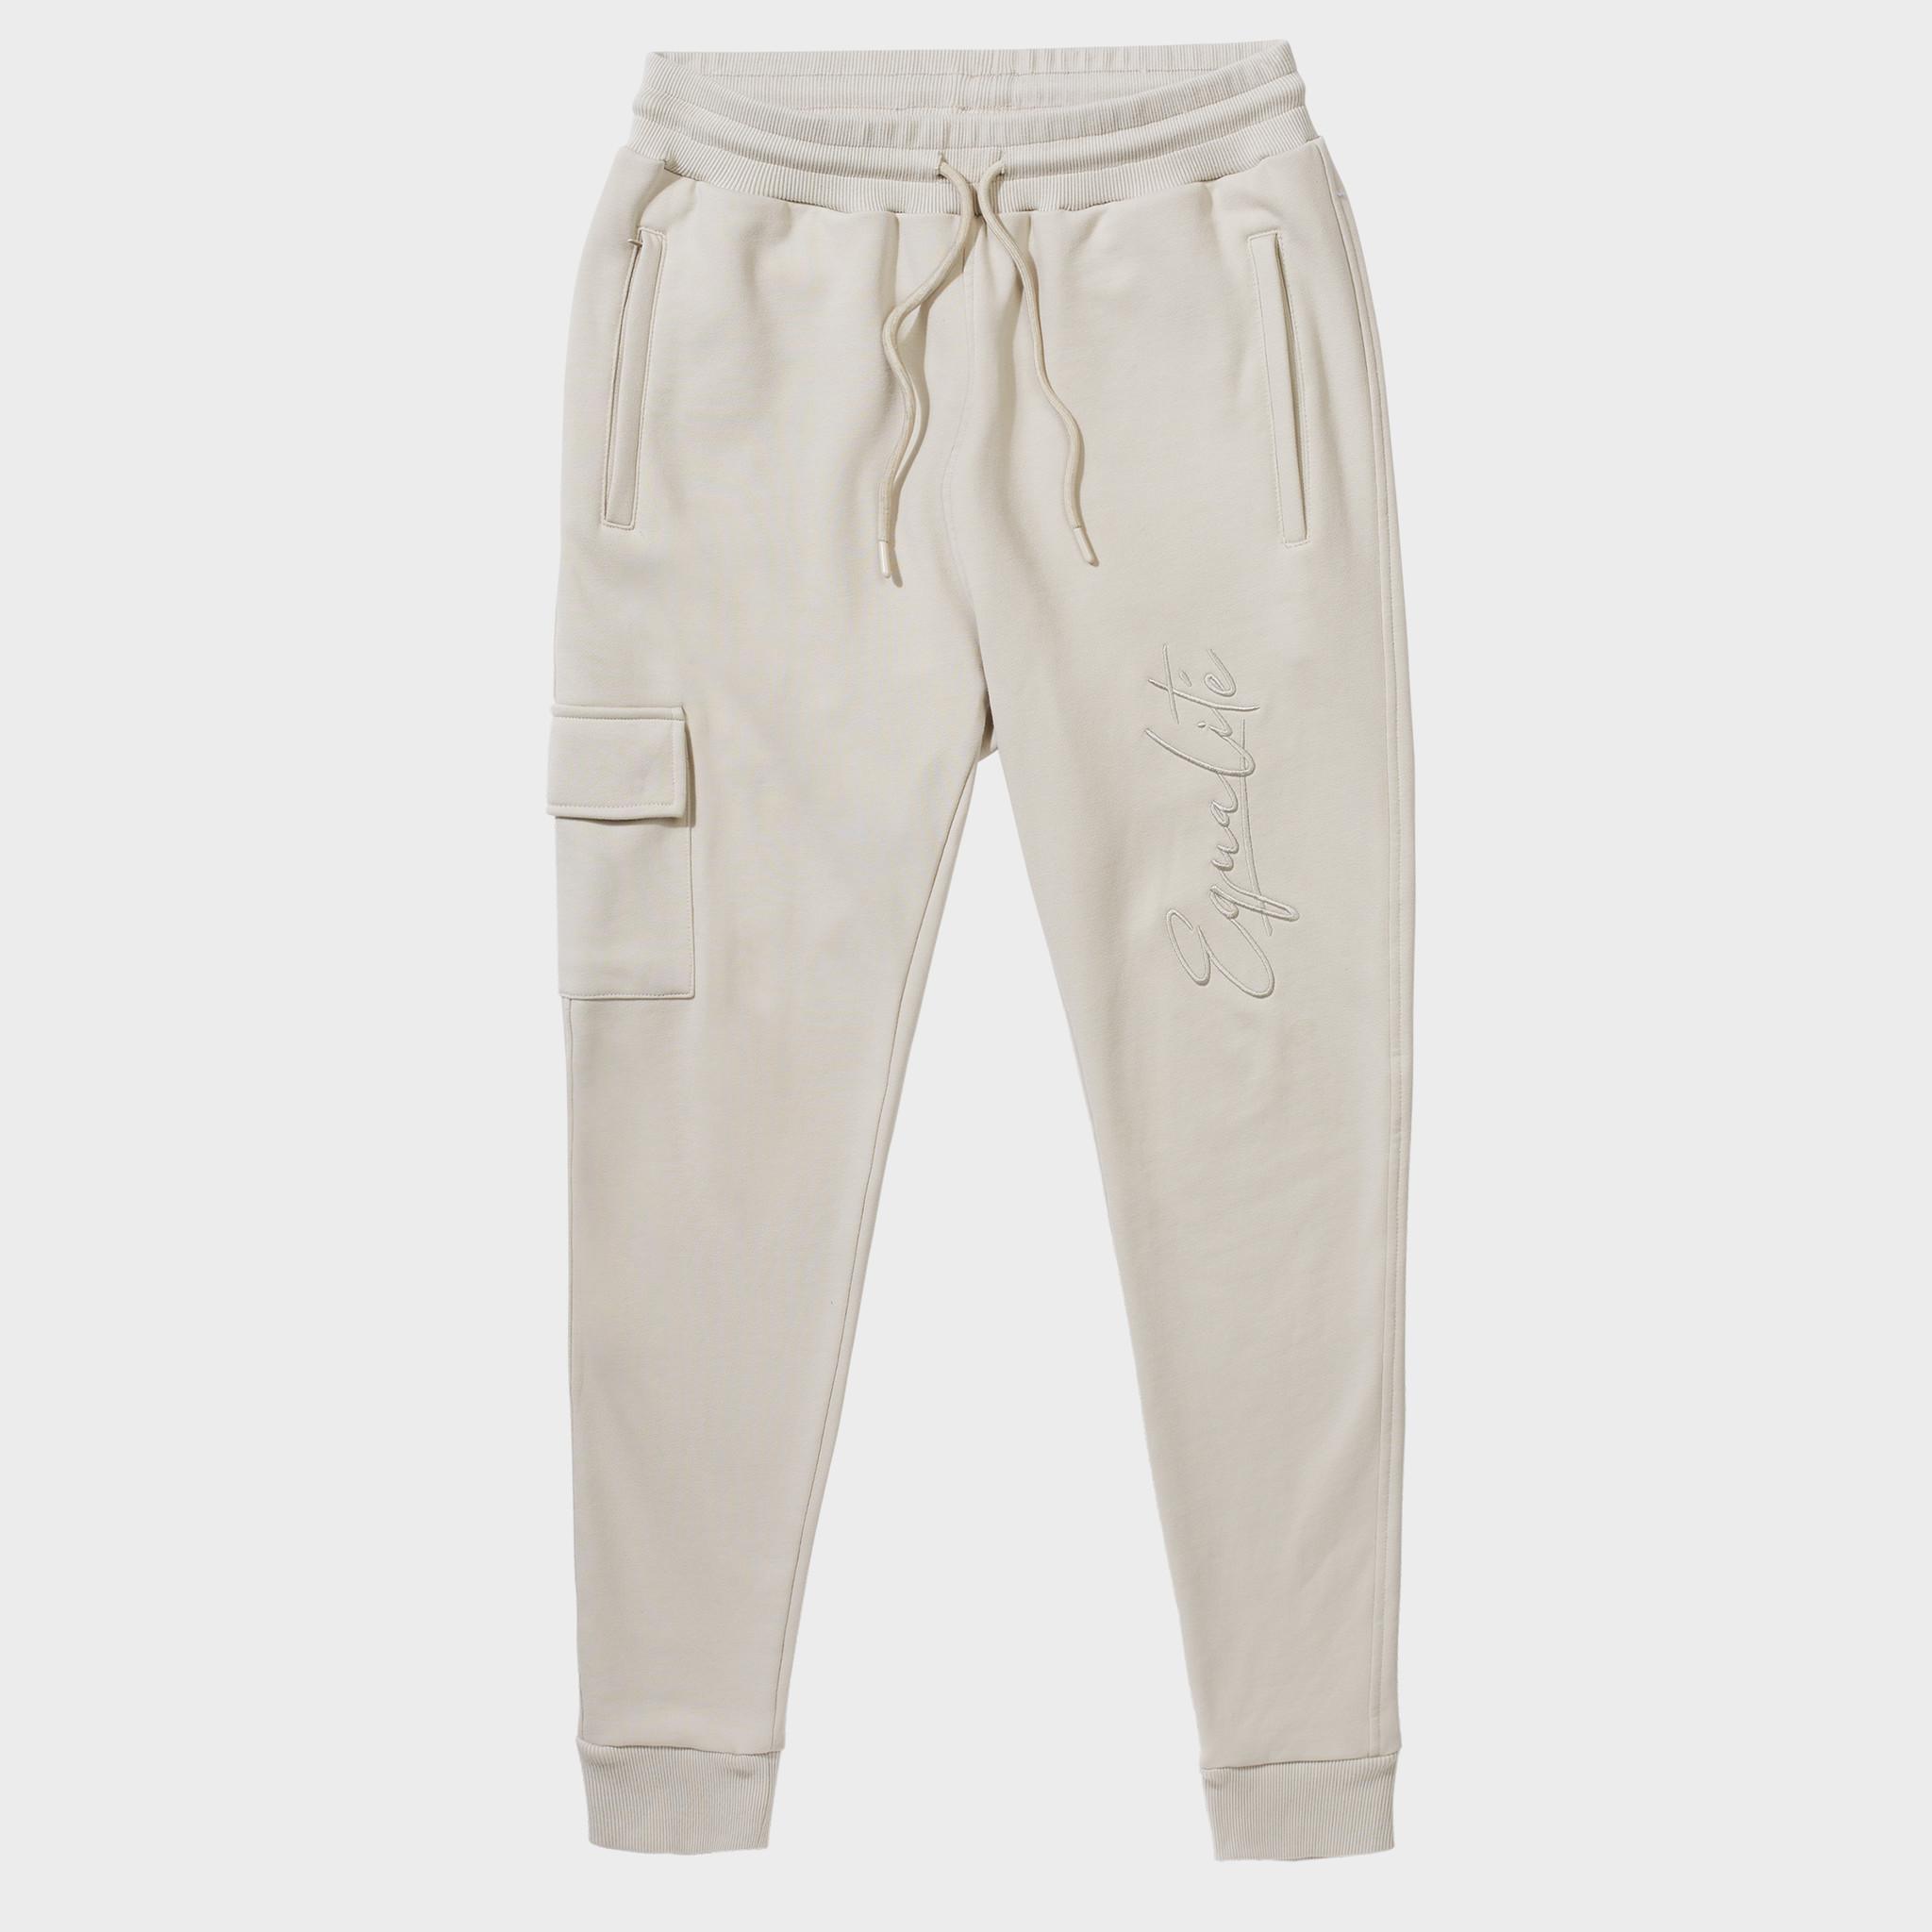 Wafi Signature Pants Beige-1